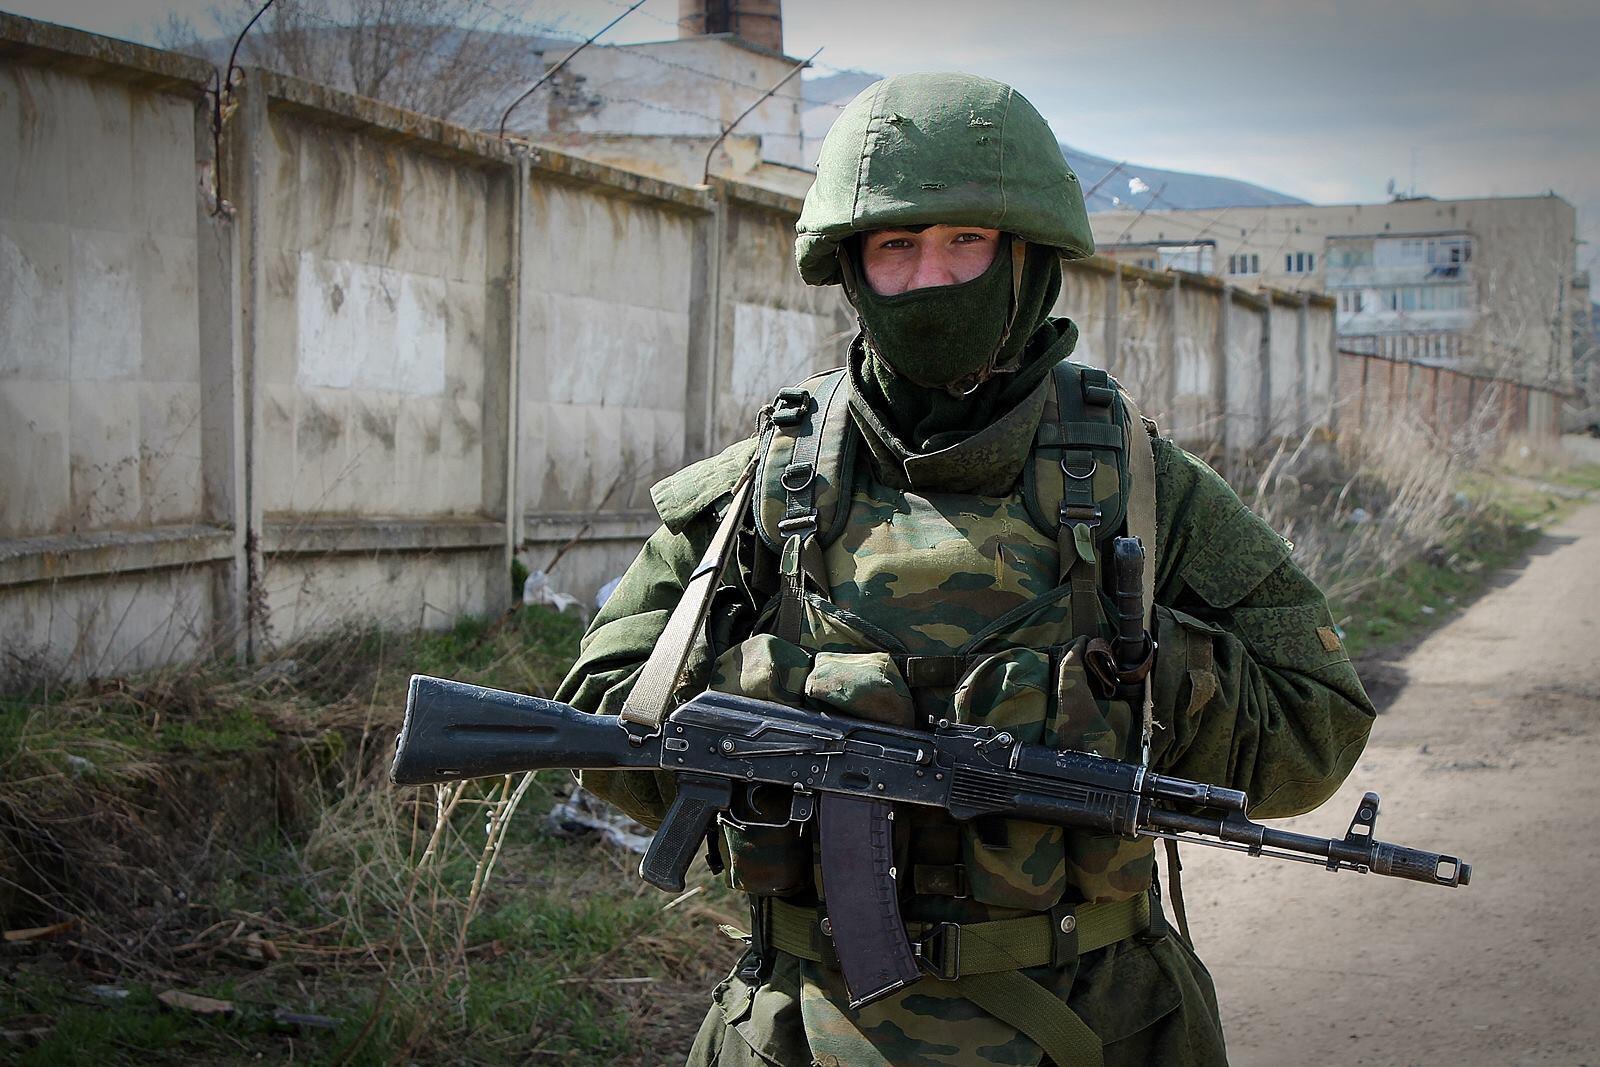 Soldier ready for war? Sunday's Crimea referendum a key moment for whats next. Photo by @wojciechkozmic http://t.co/UzIHmXBGof